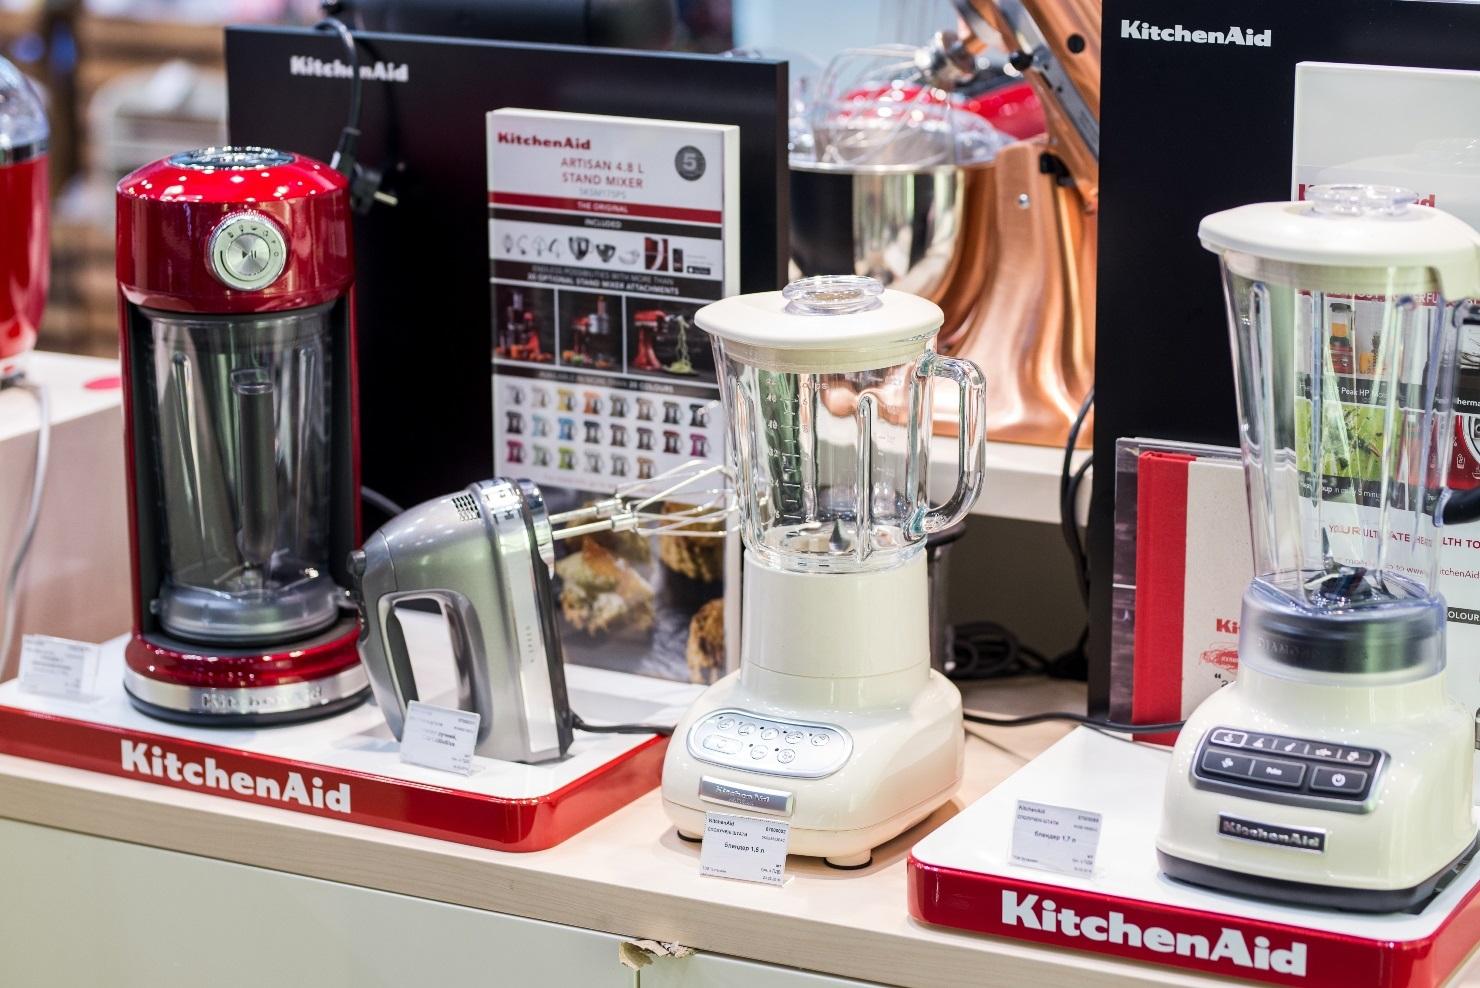 Блендер стационарный KitchenAid Diamond, объем чаши 1,75 л, кремовый KitchenAid 5KSB1585EAC фото 5